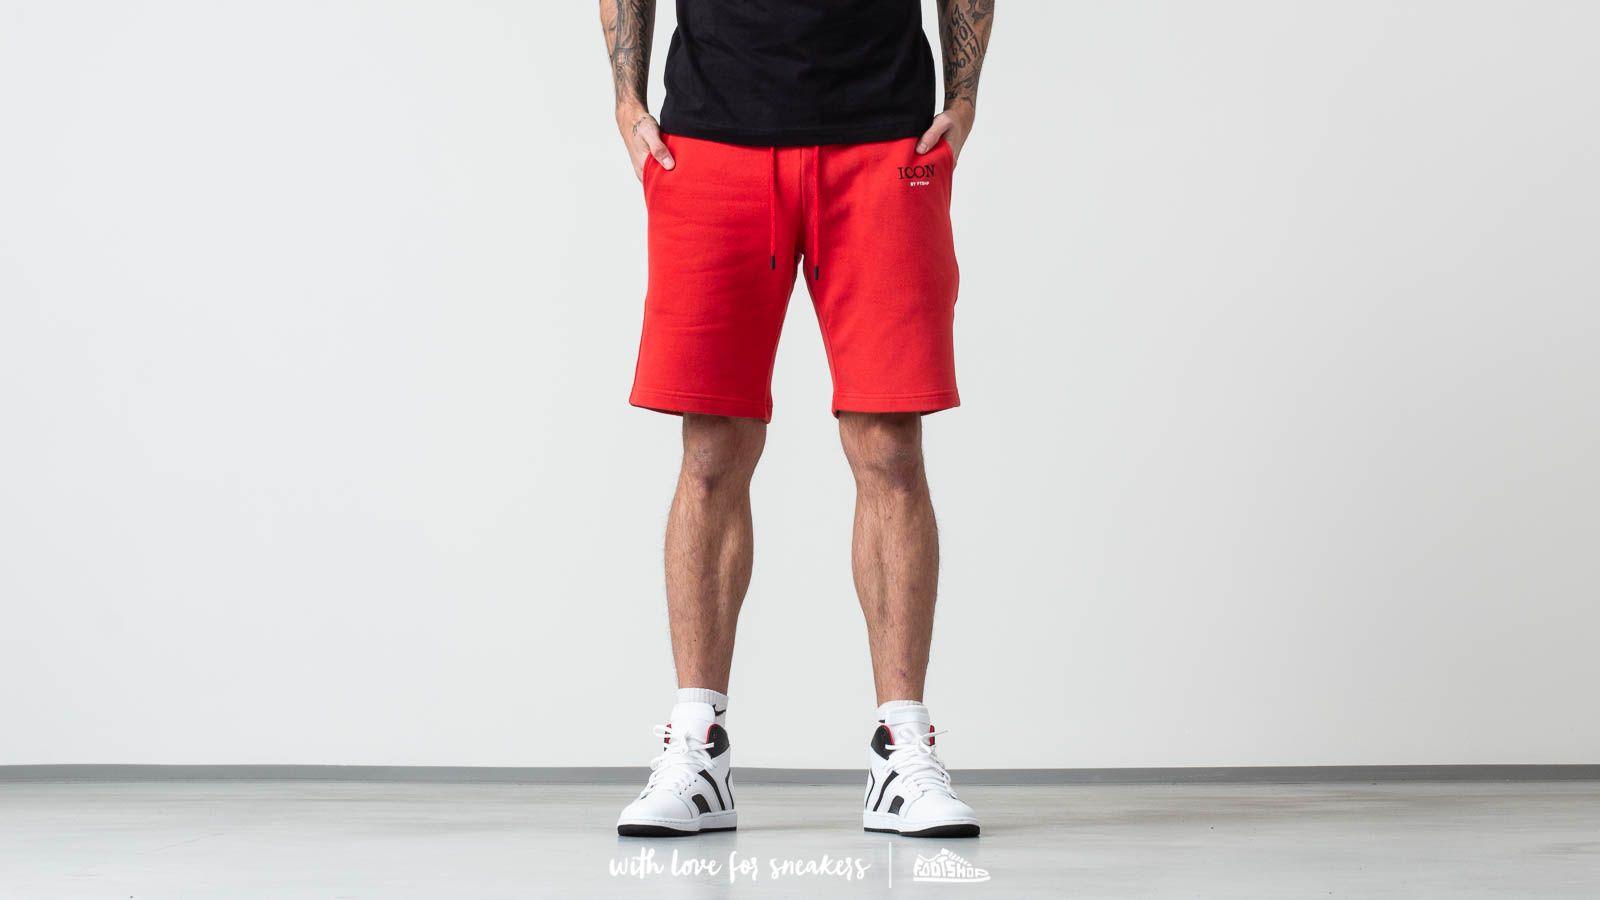 FTSHP x Rytmus Shorts